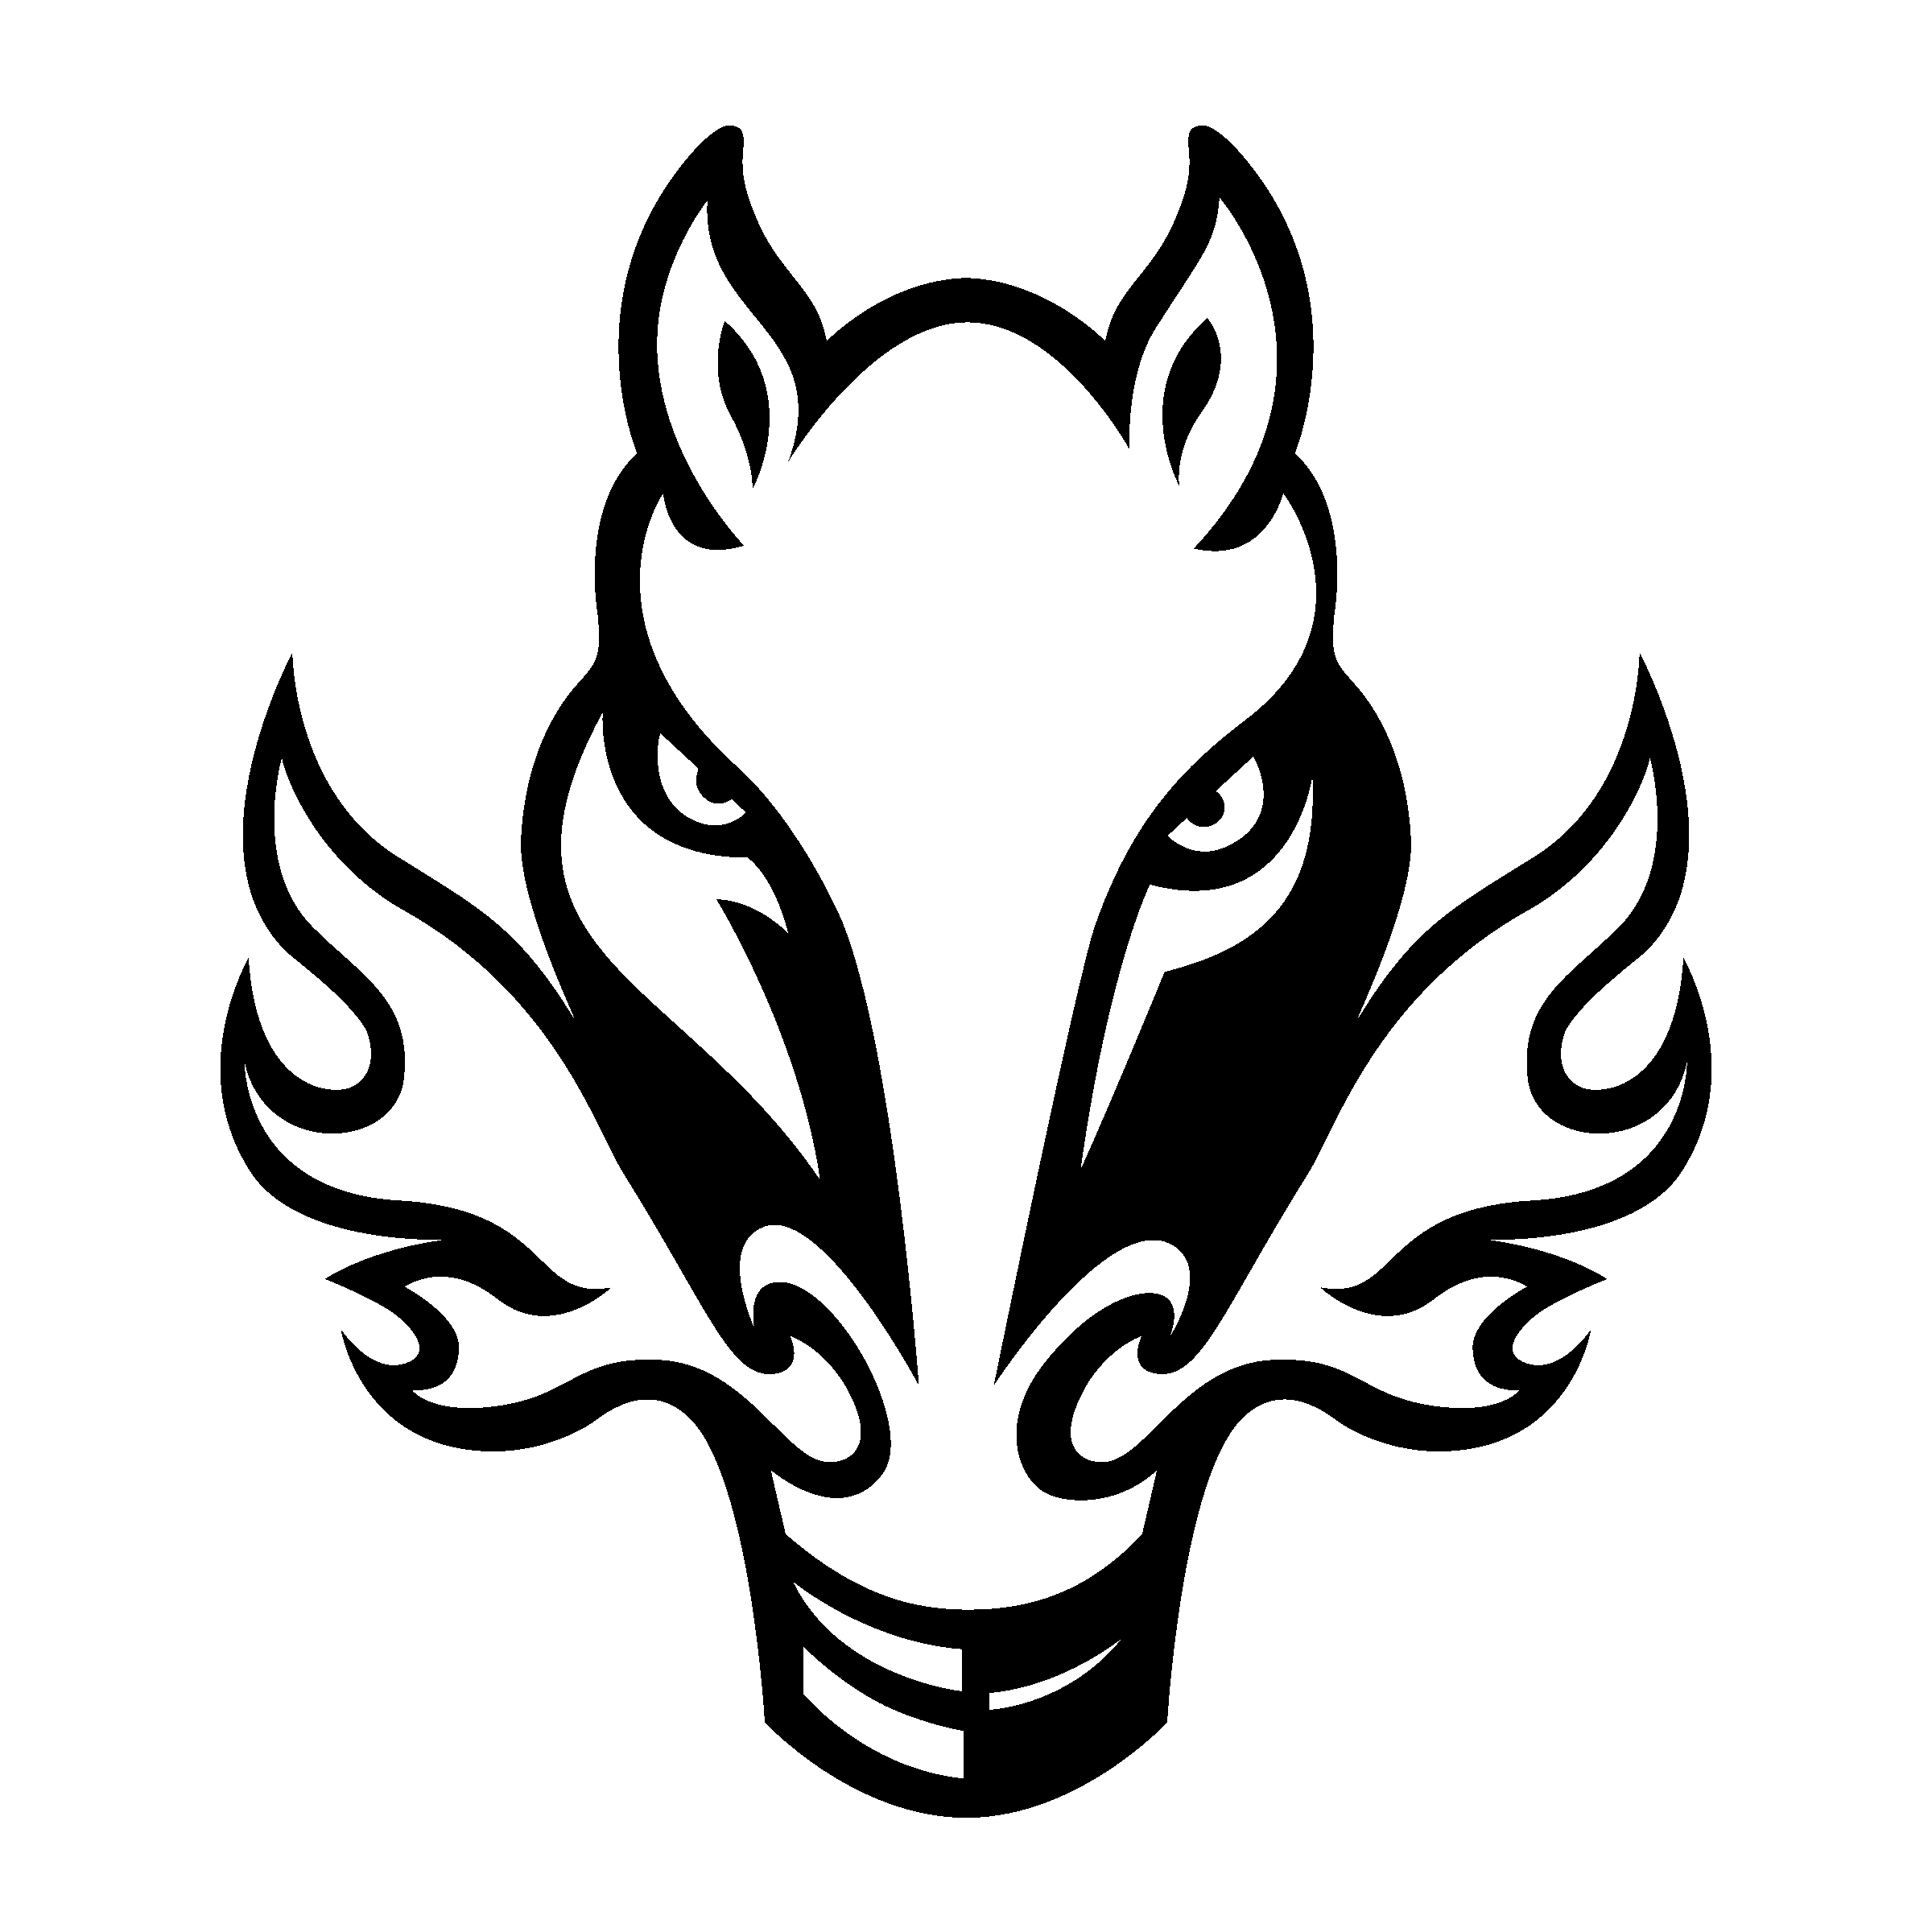 Calgary Flames Logo Png Transparent Amp Svg Vector Freebie